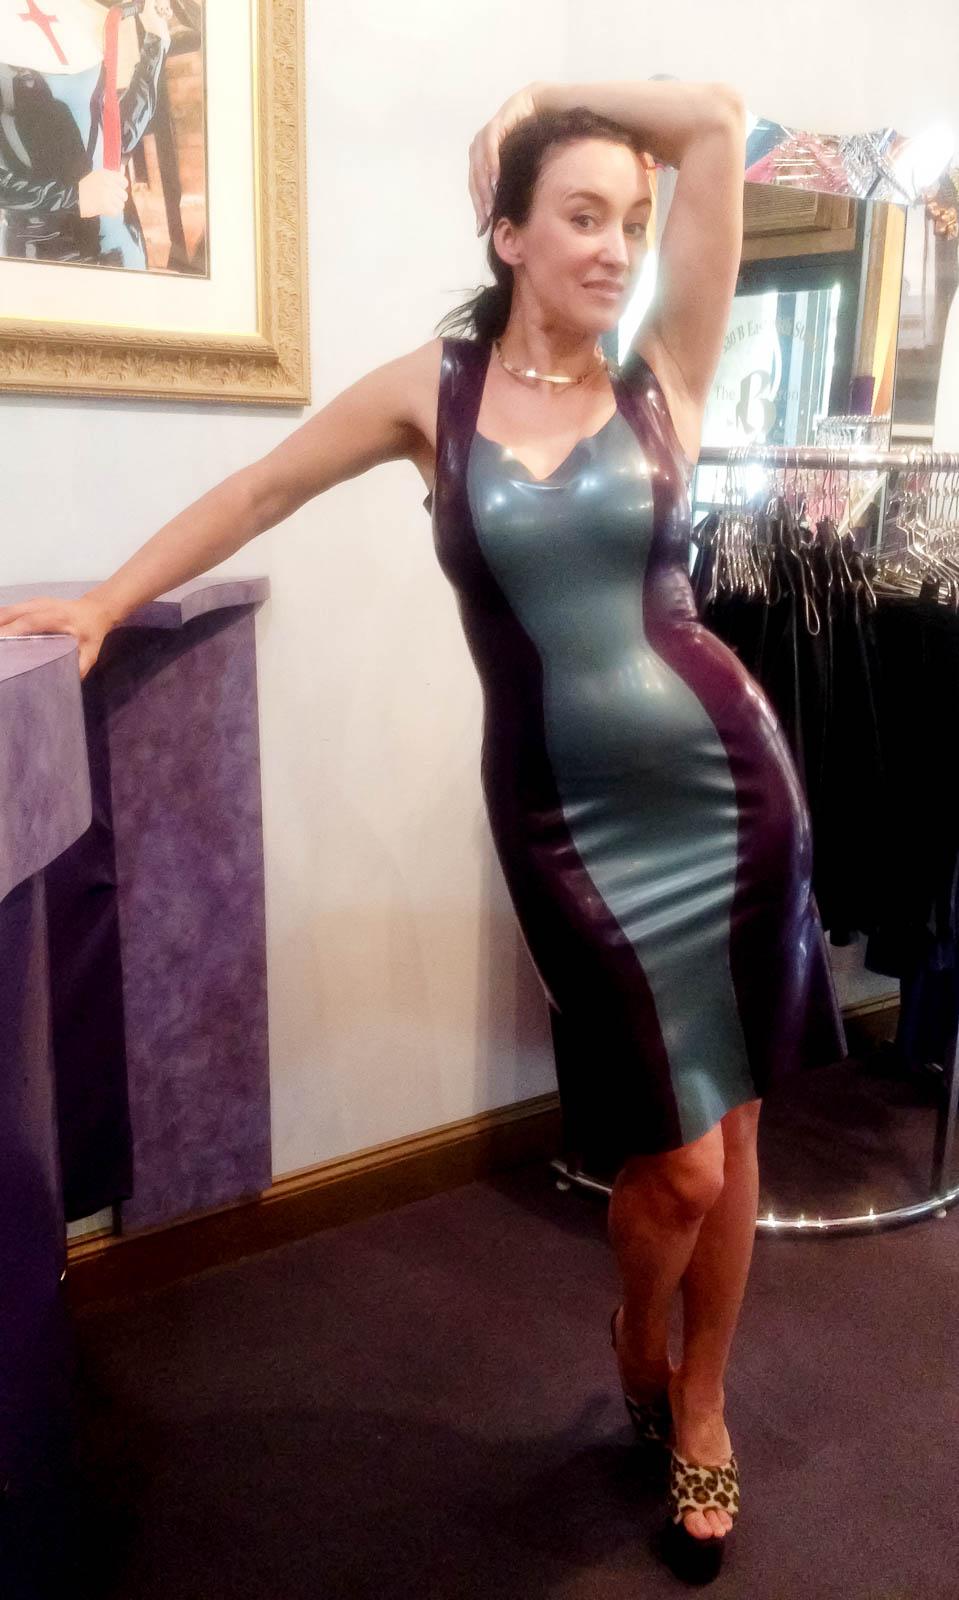 Las vegas fetish model summer hart mom pov exclusive hd vid - 1 part 8